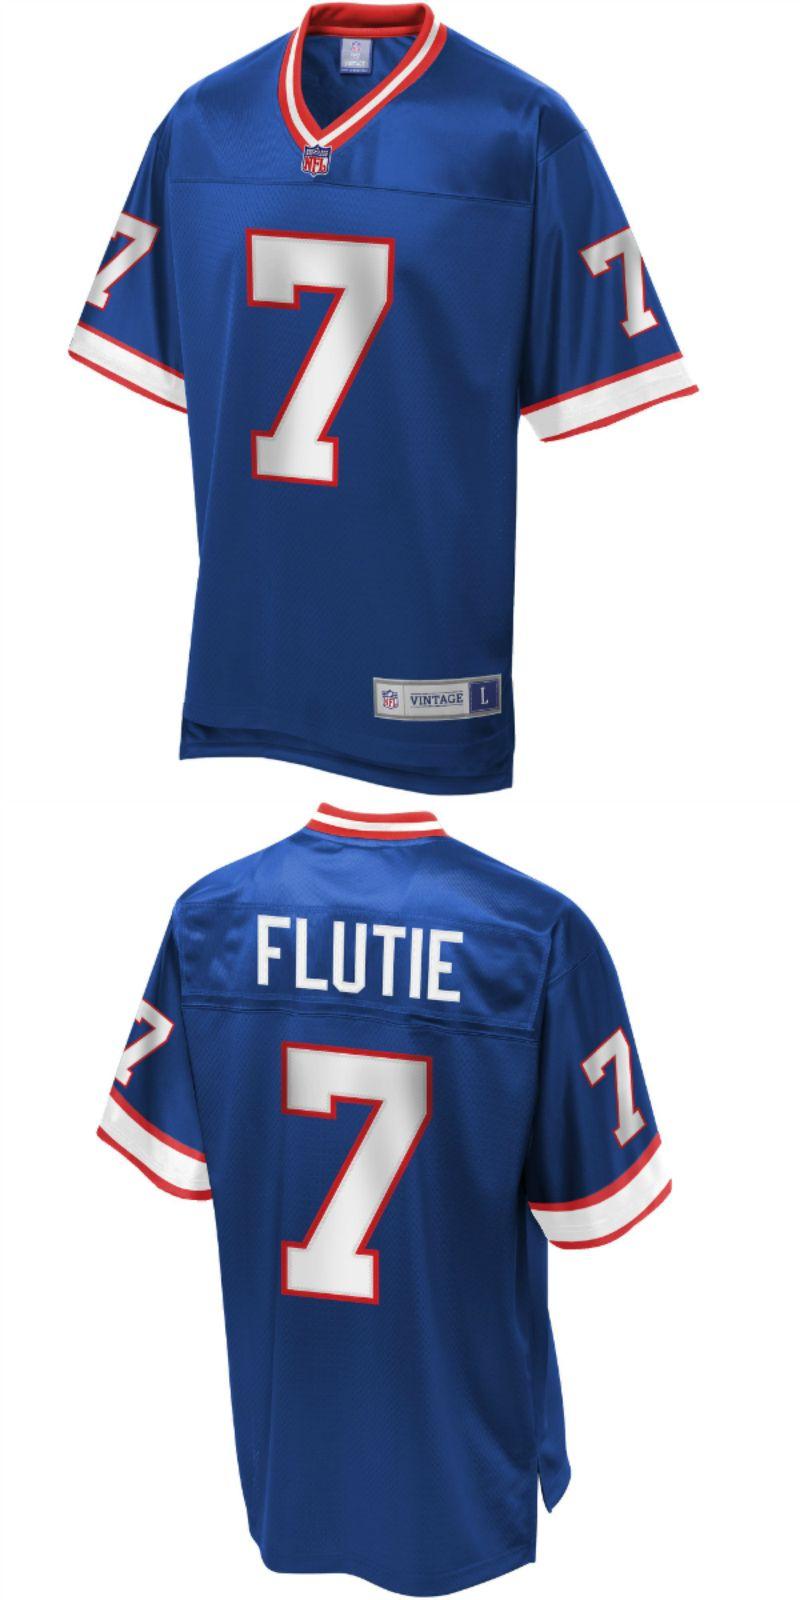 competitive price f1b4c 946f4 Doug Flutie Buffalo Bills NFL Pro Line Retired Player Jersey ...